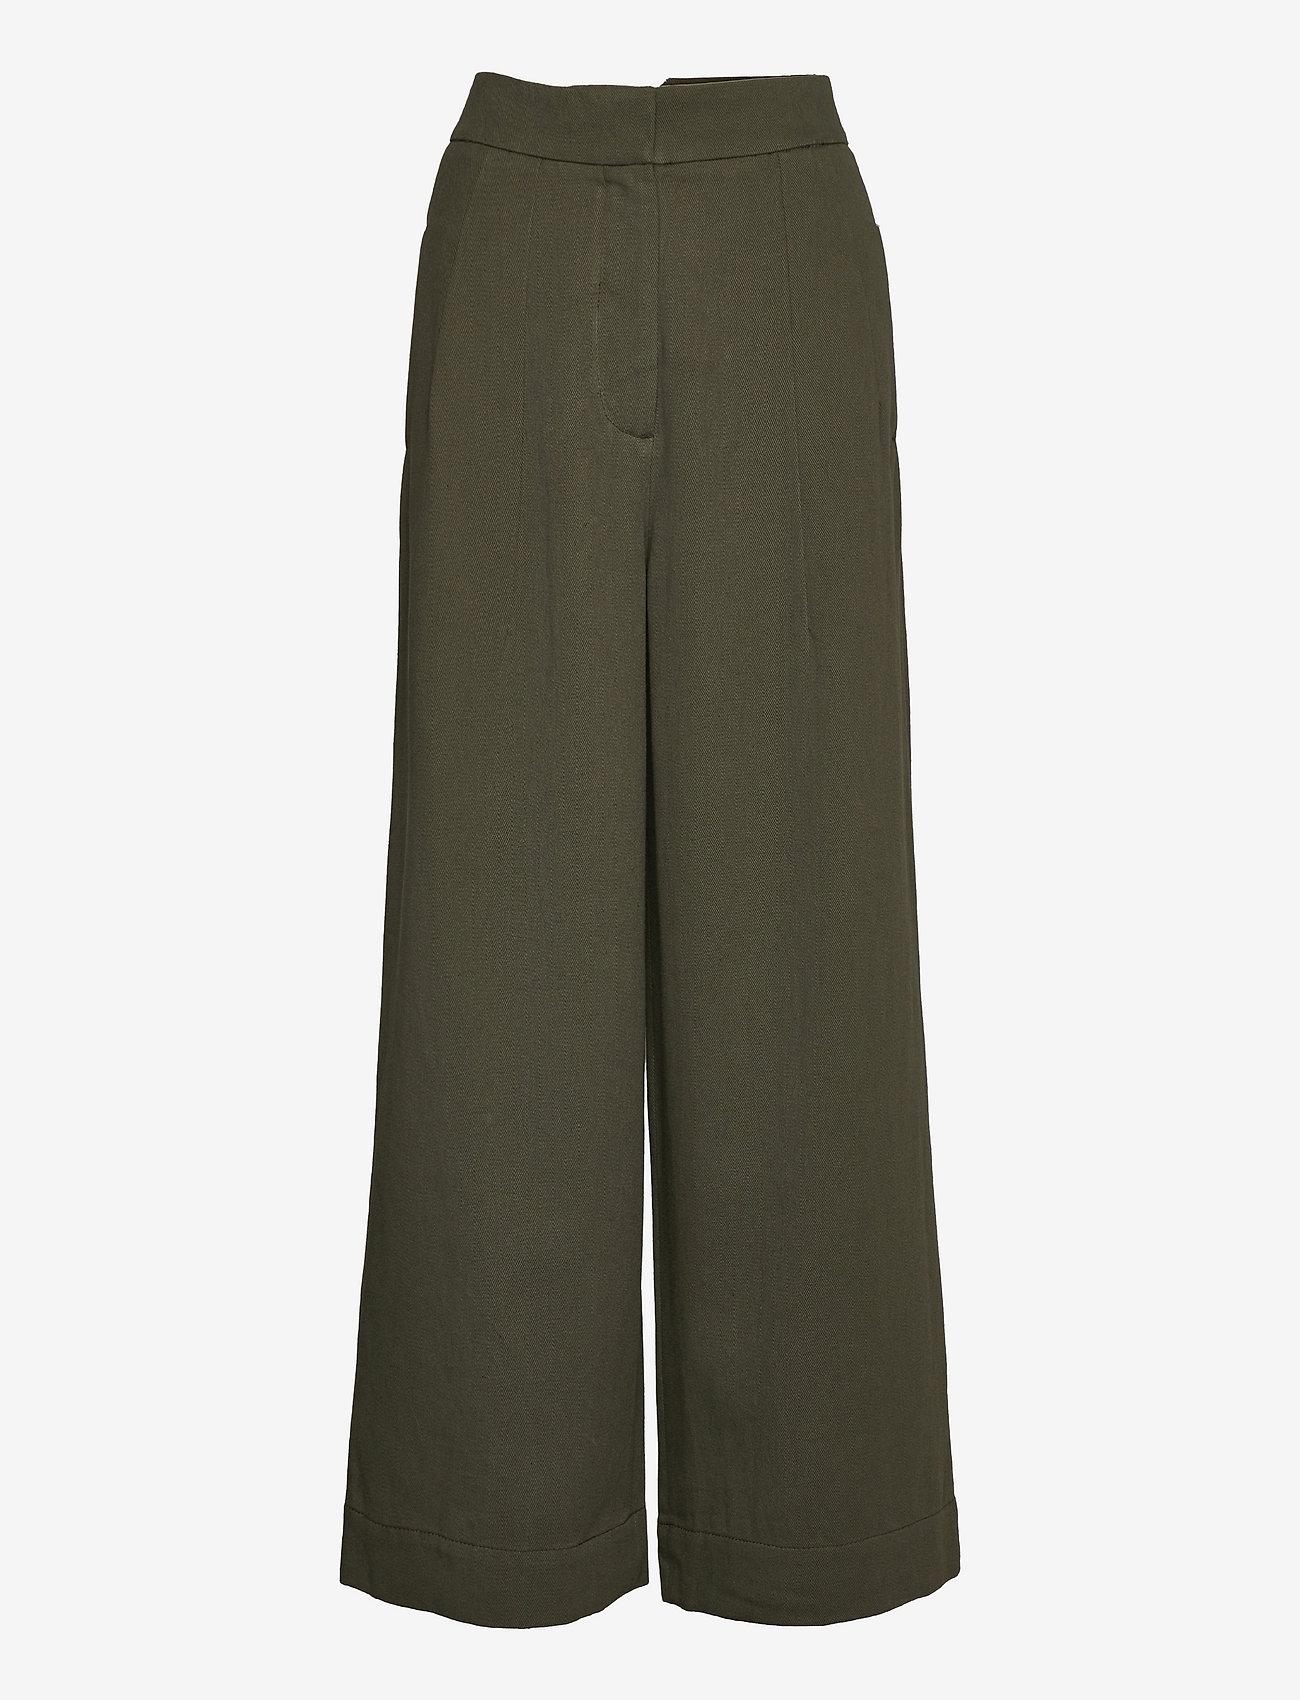 Cathrine Hammel - Twill wide leg pants - bukser med brede ben - army green - 0